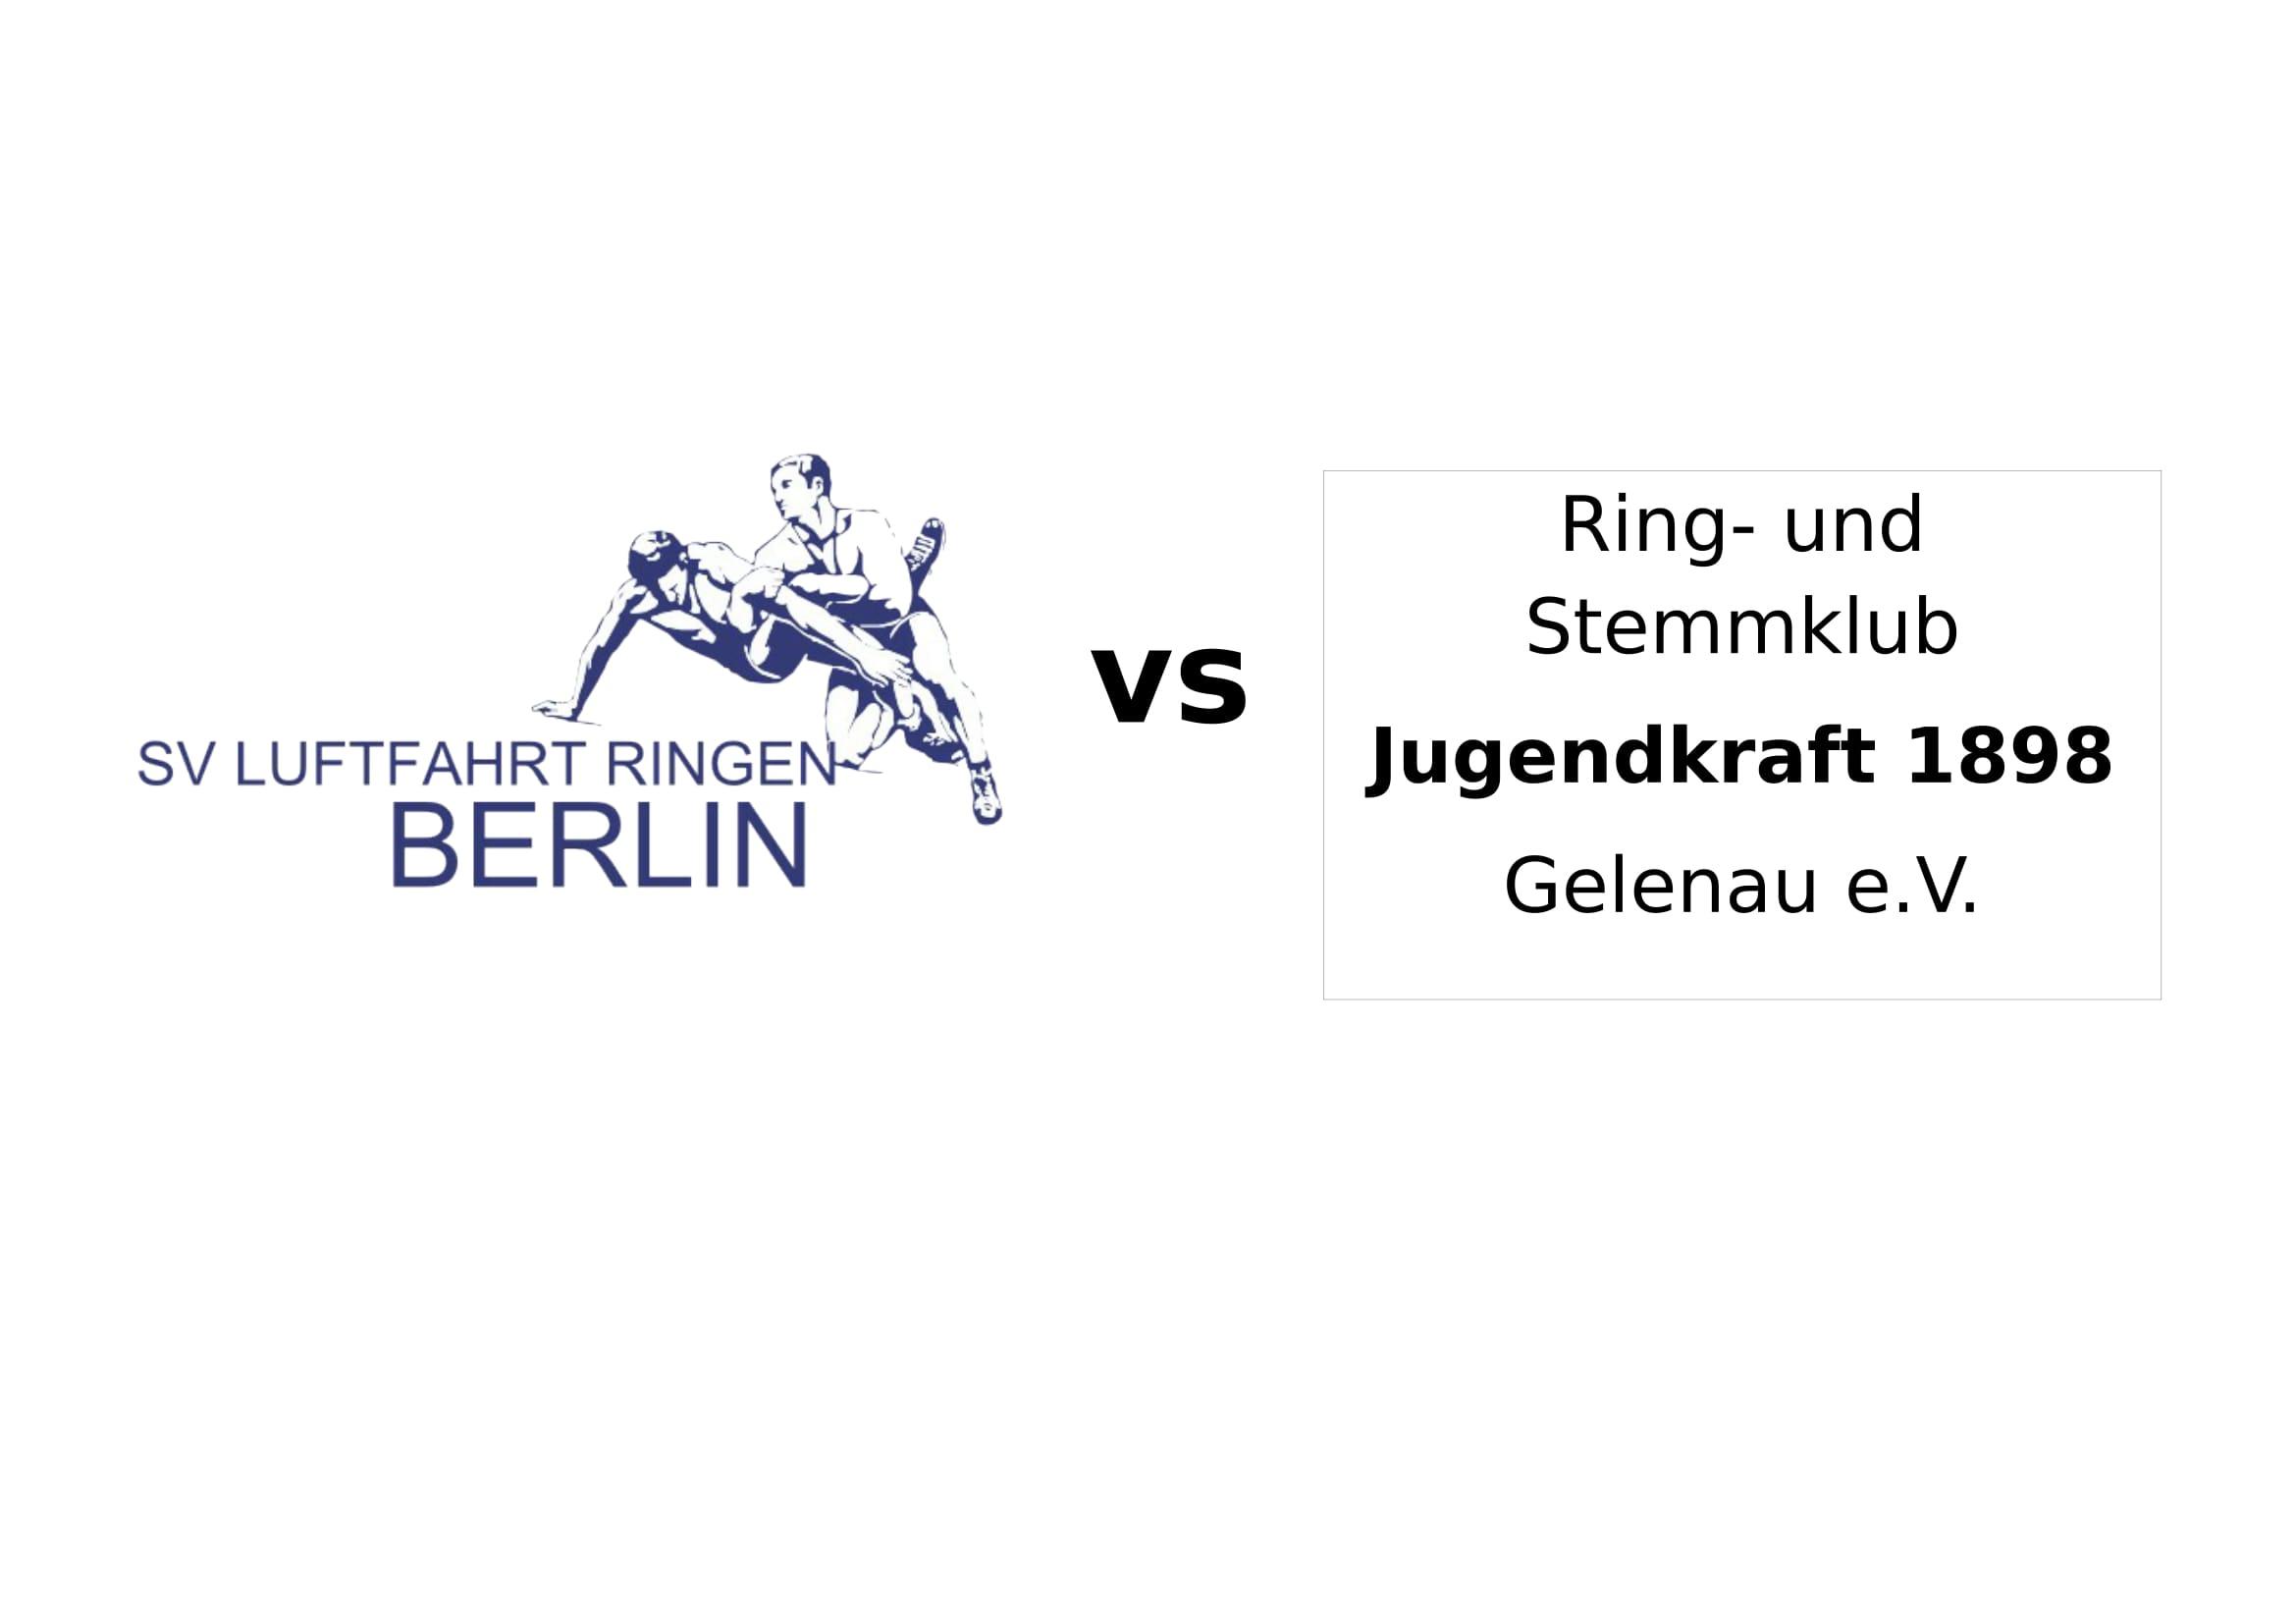 RL-Heimkampf SVL vs. RS Gelenau